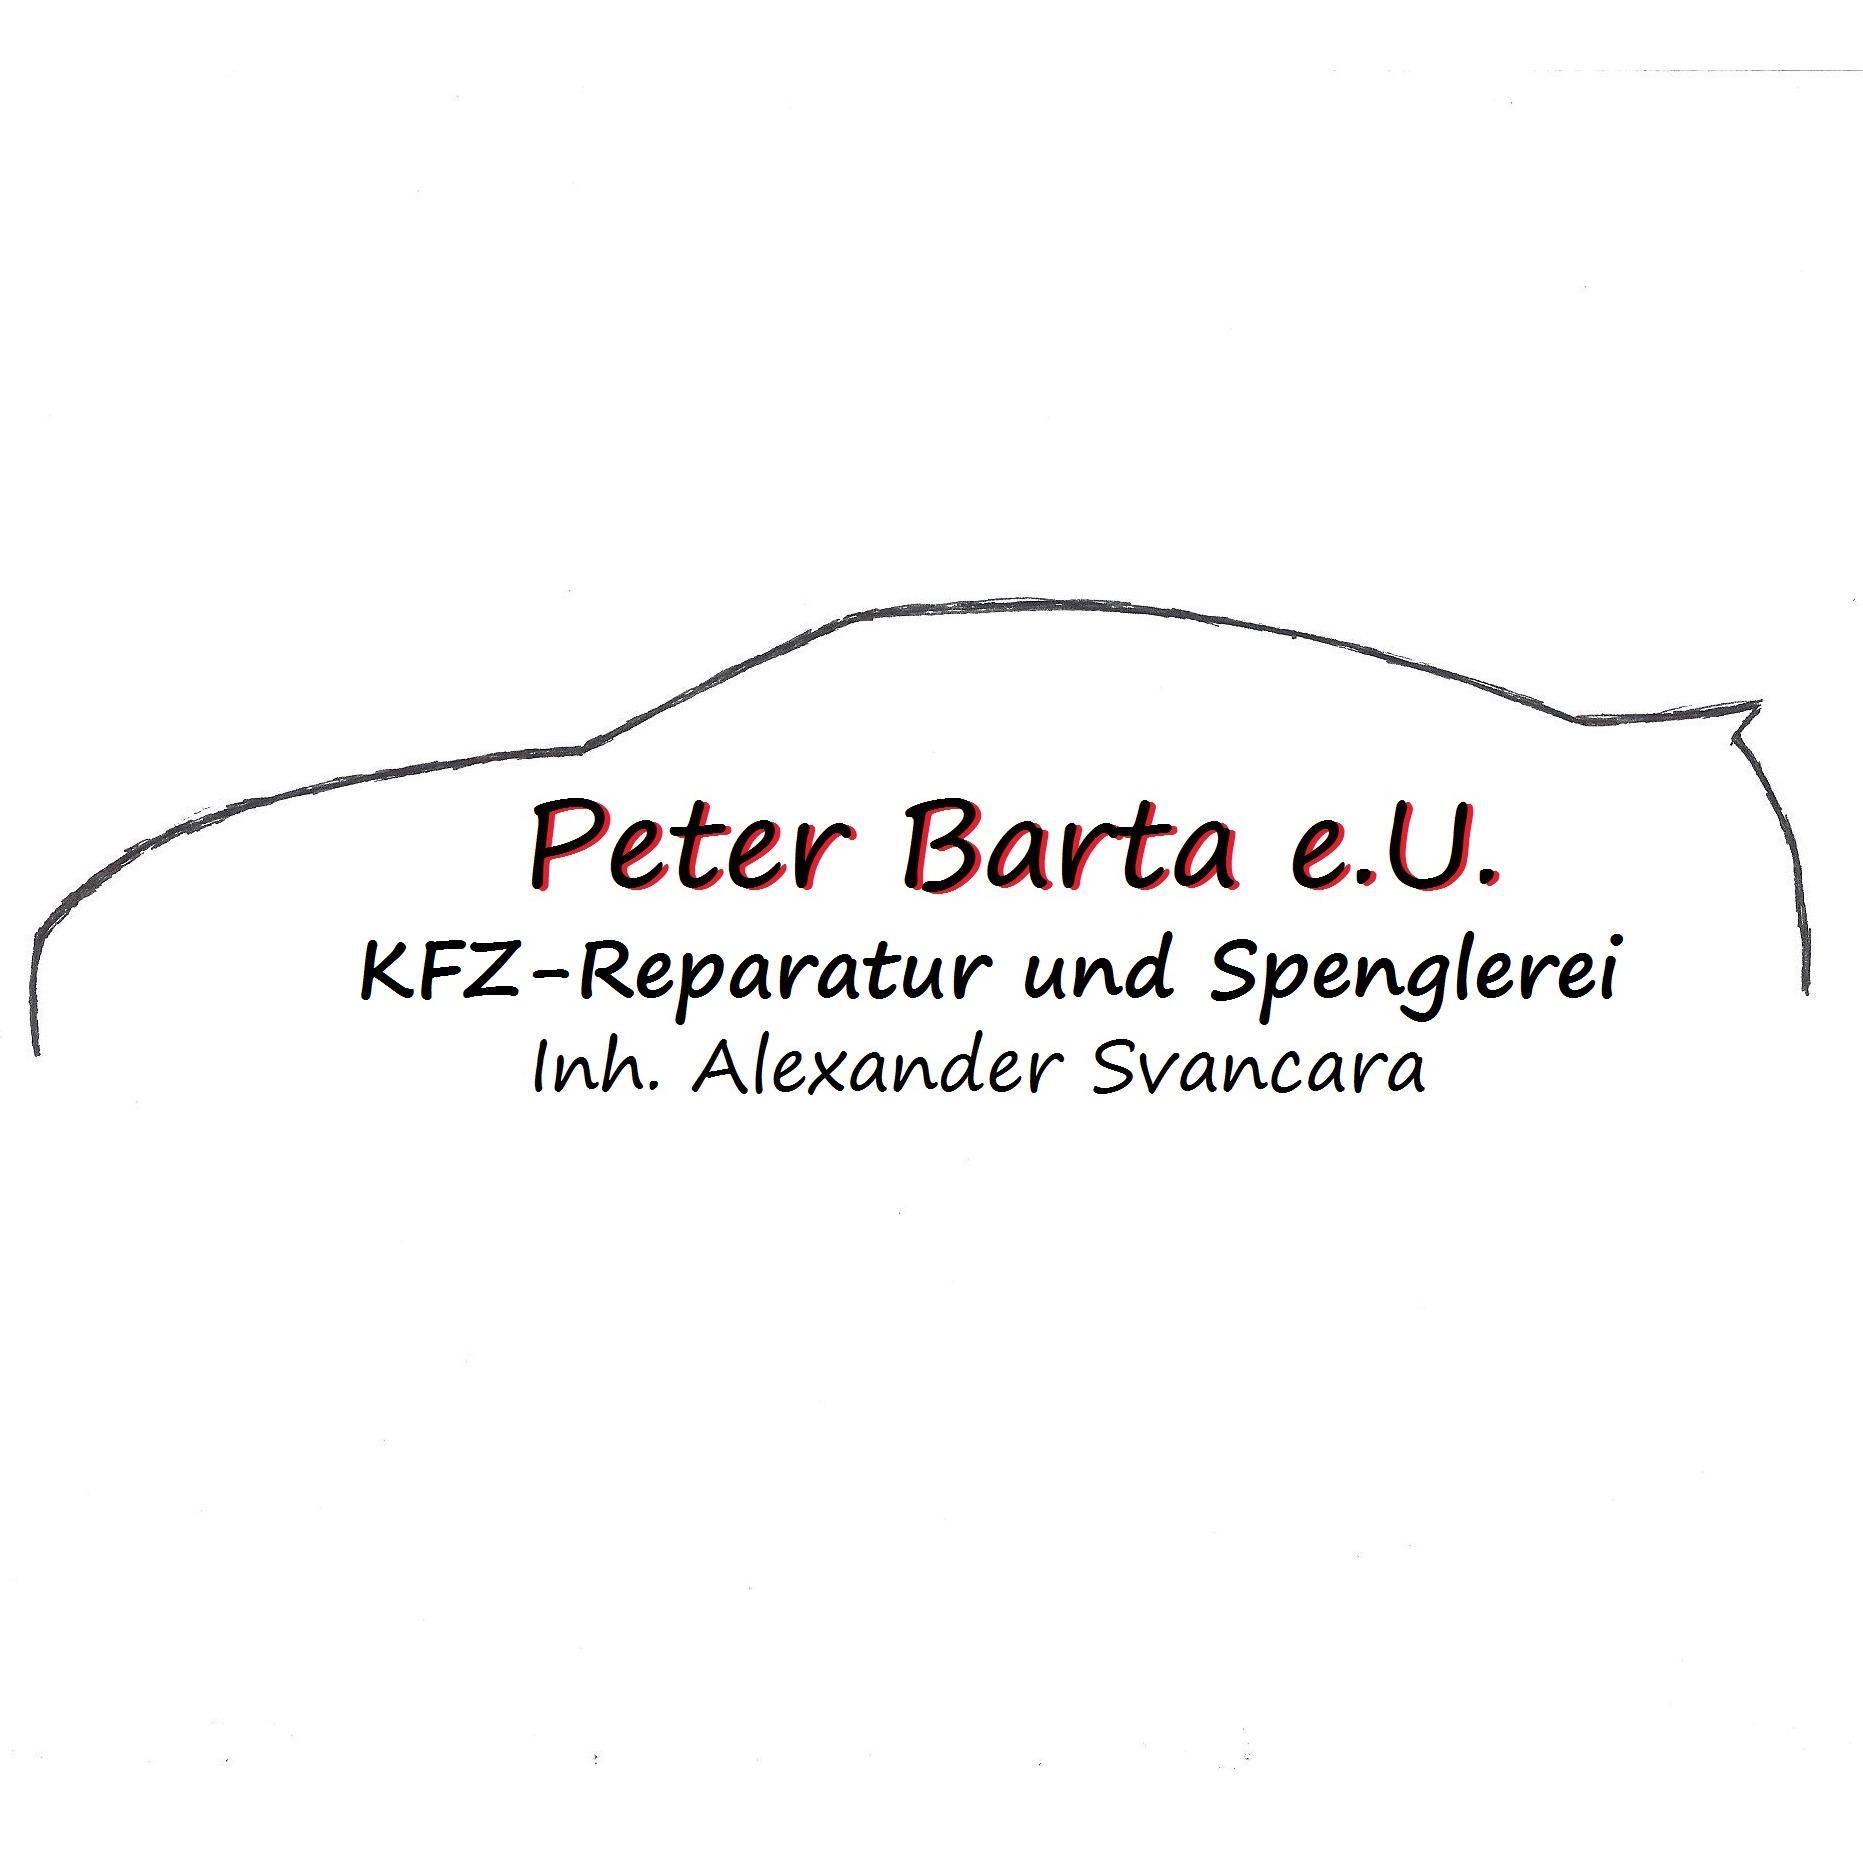 Peter Barta e.U.